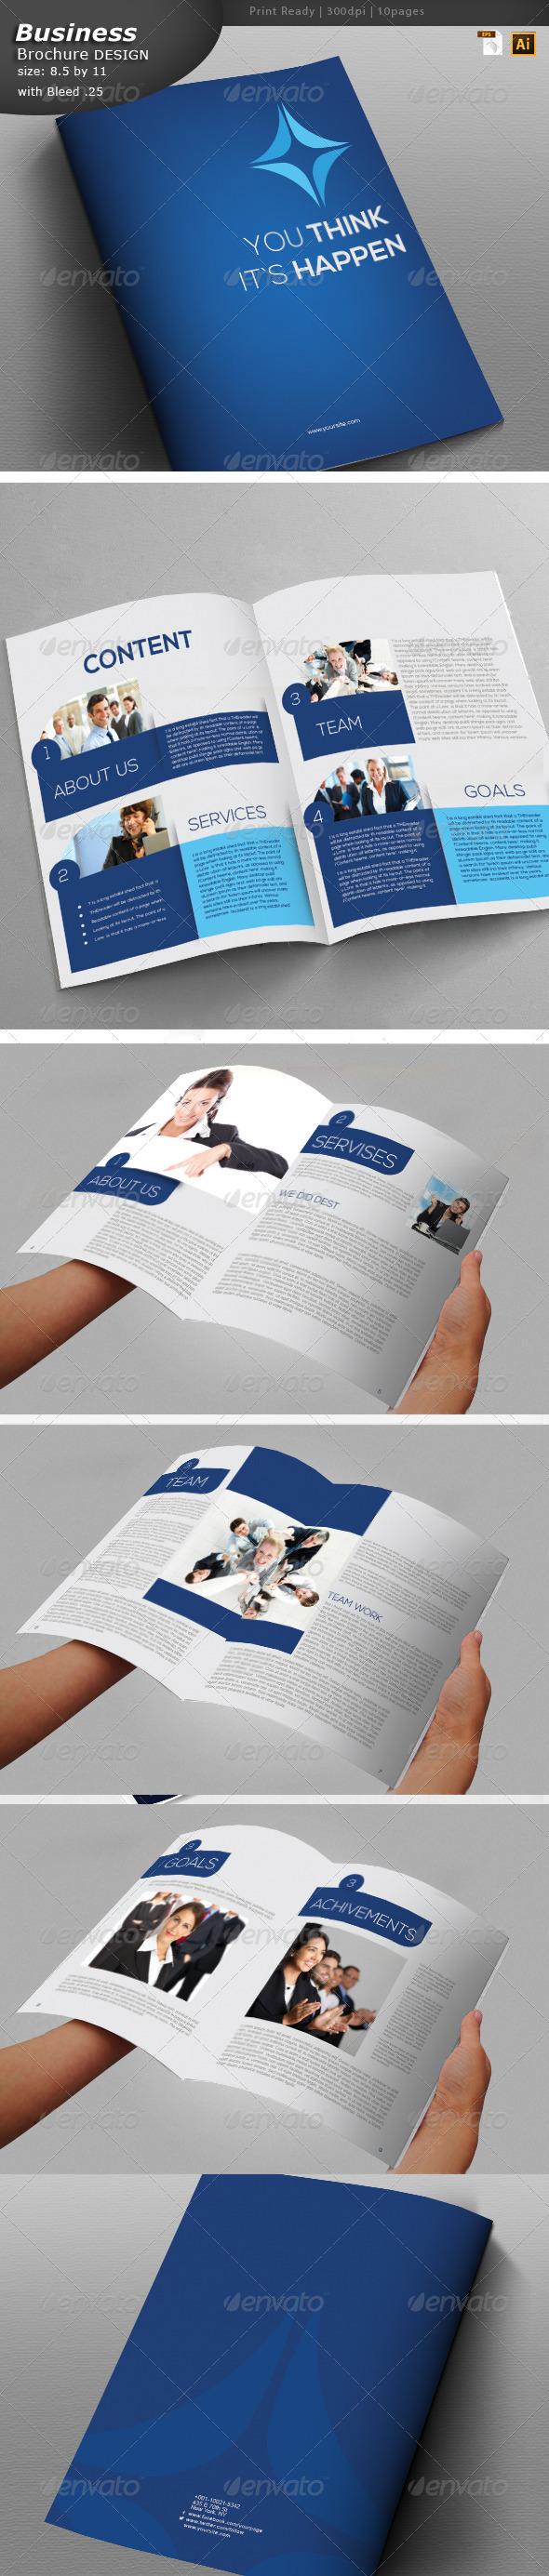 Business Brochure Design  - Brochures Print Templates